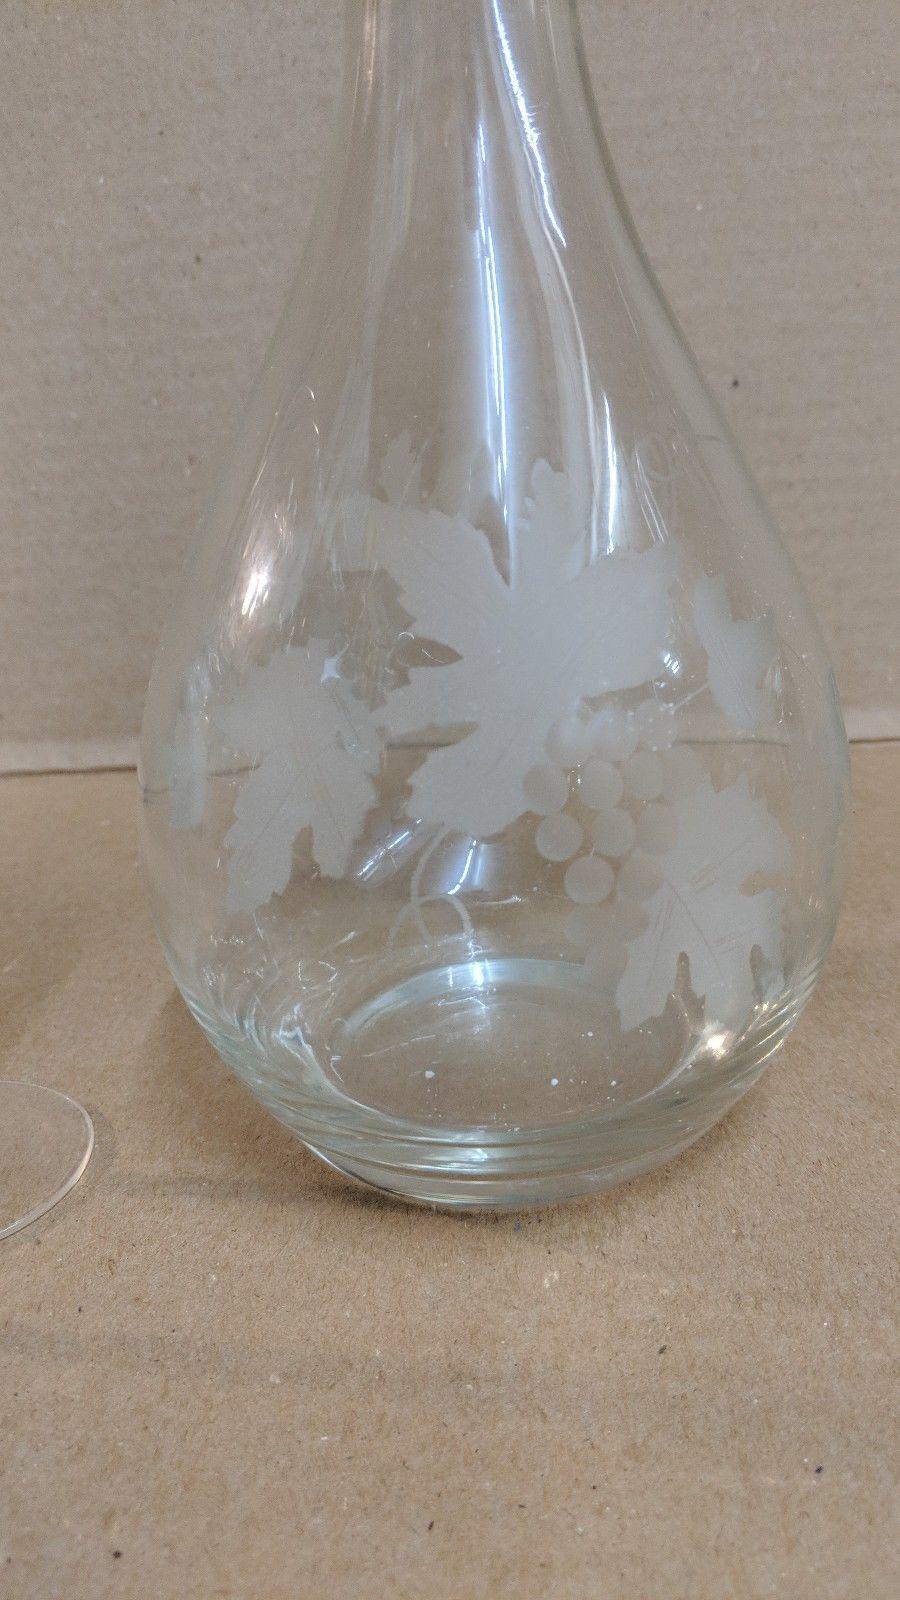 Etched Grape Leaf Design Stemware 6 Glasses and decanter